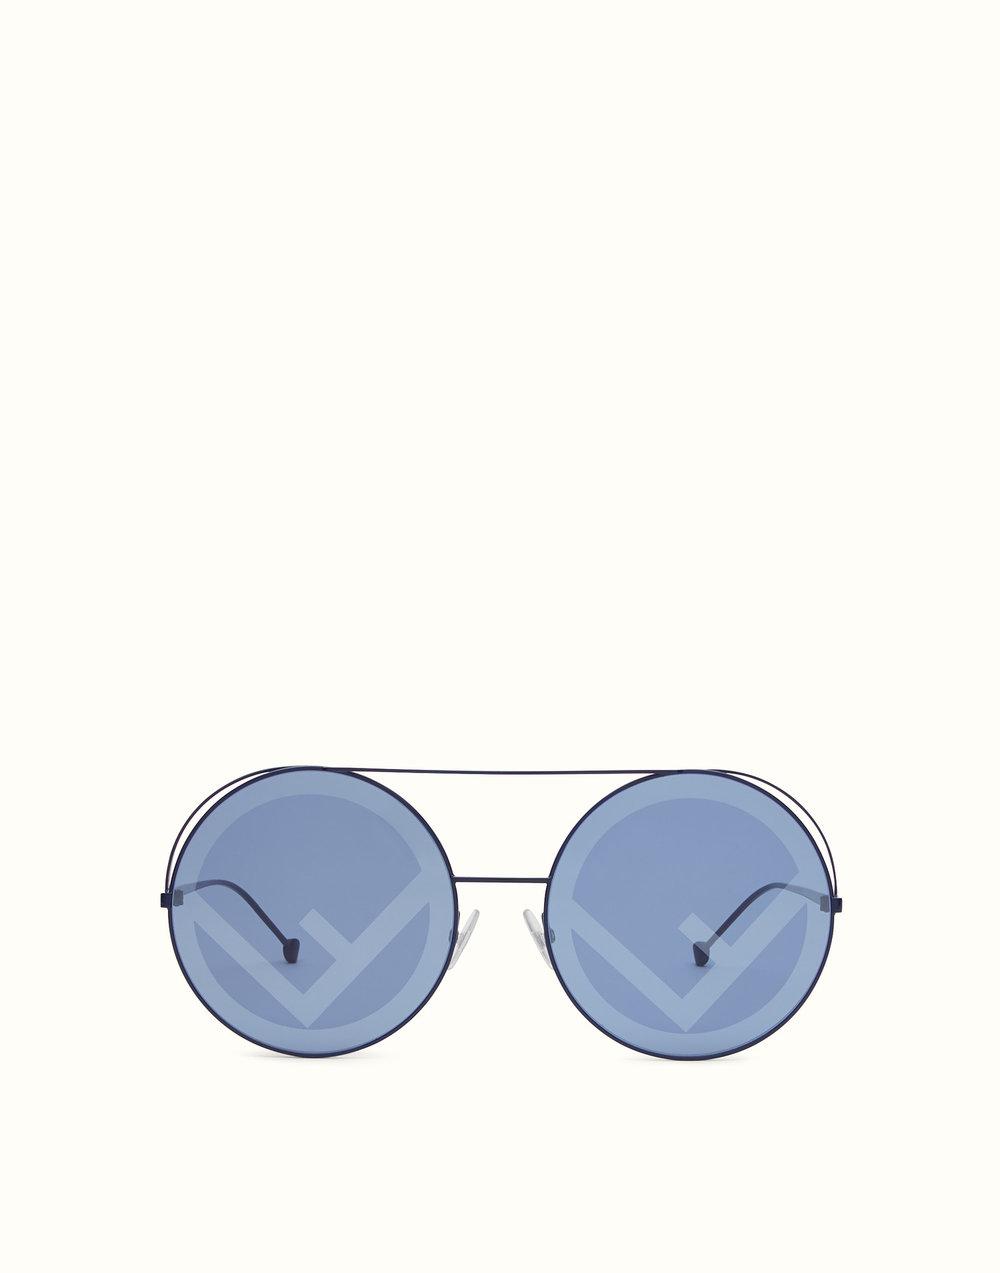 Fendi runaway blue.jpg